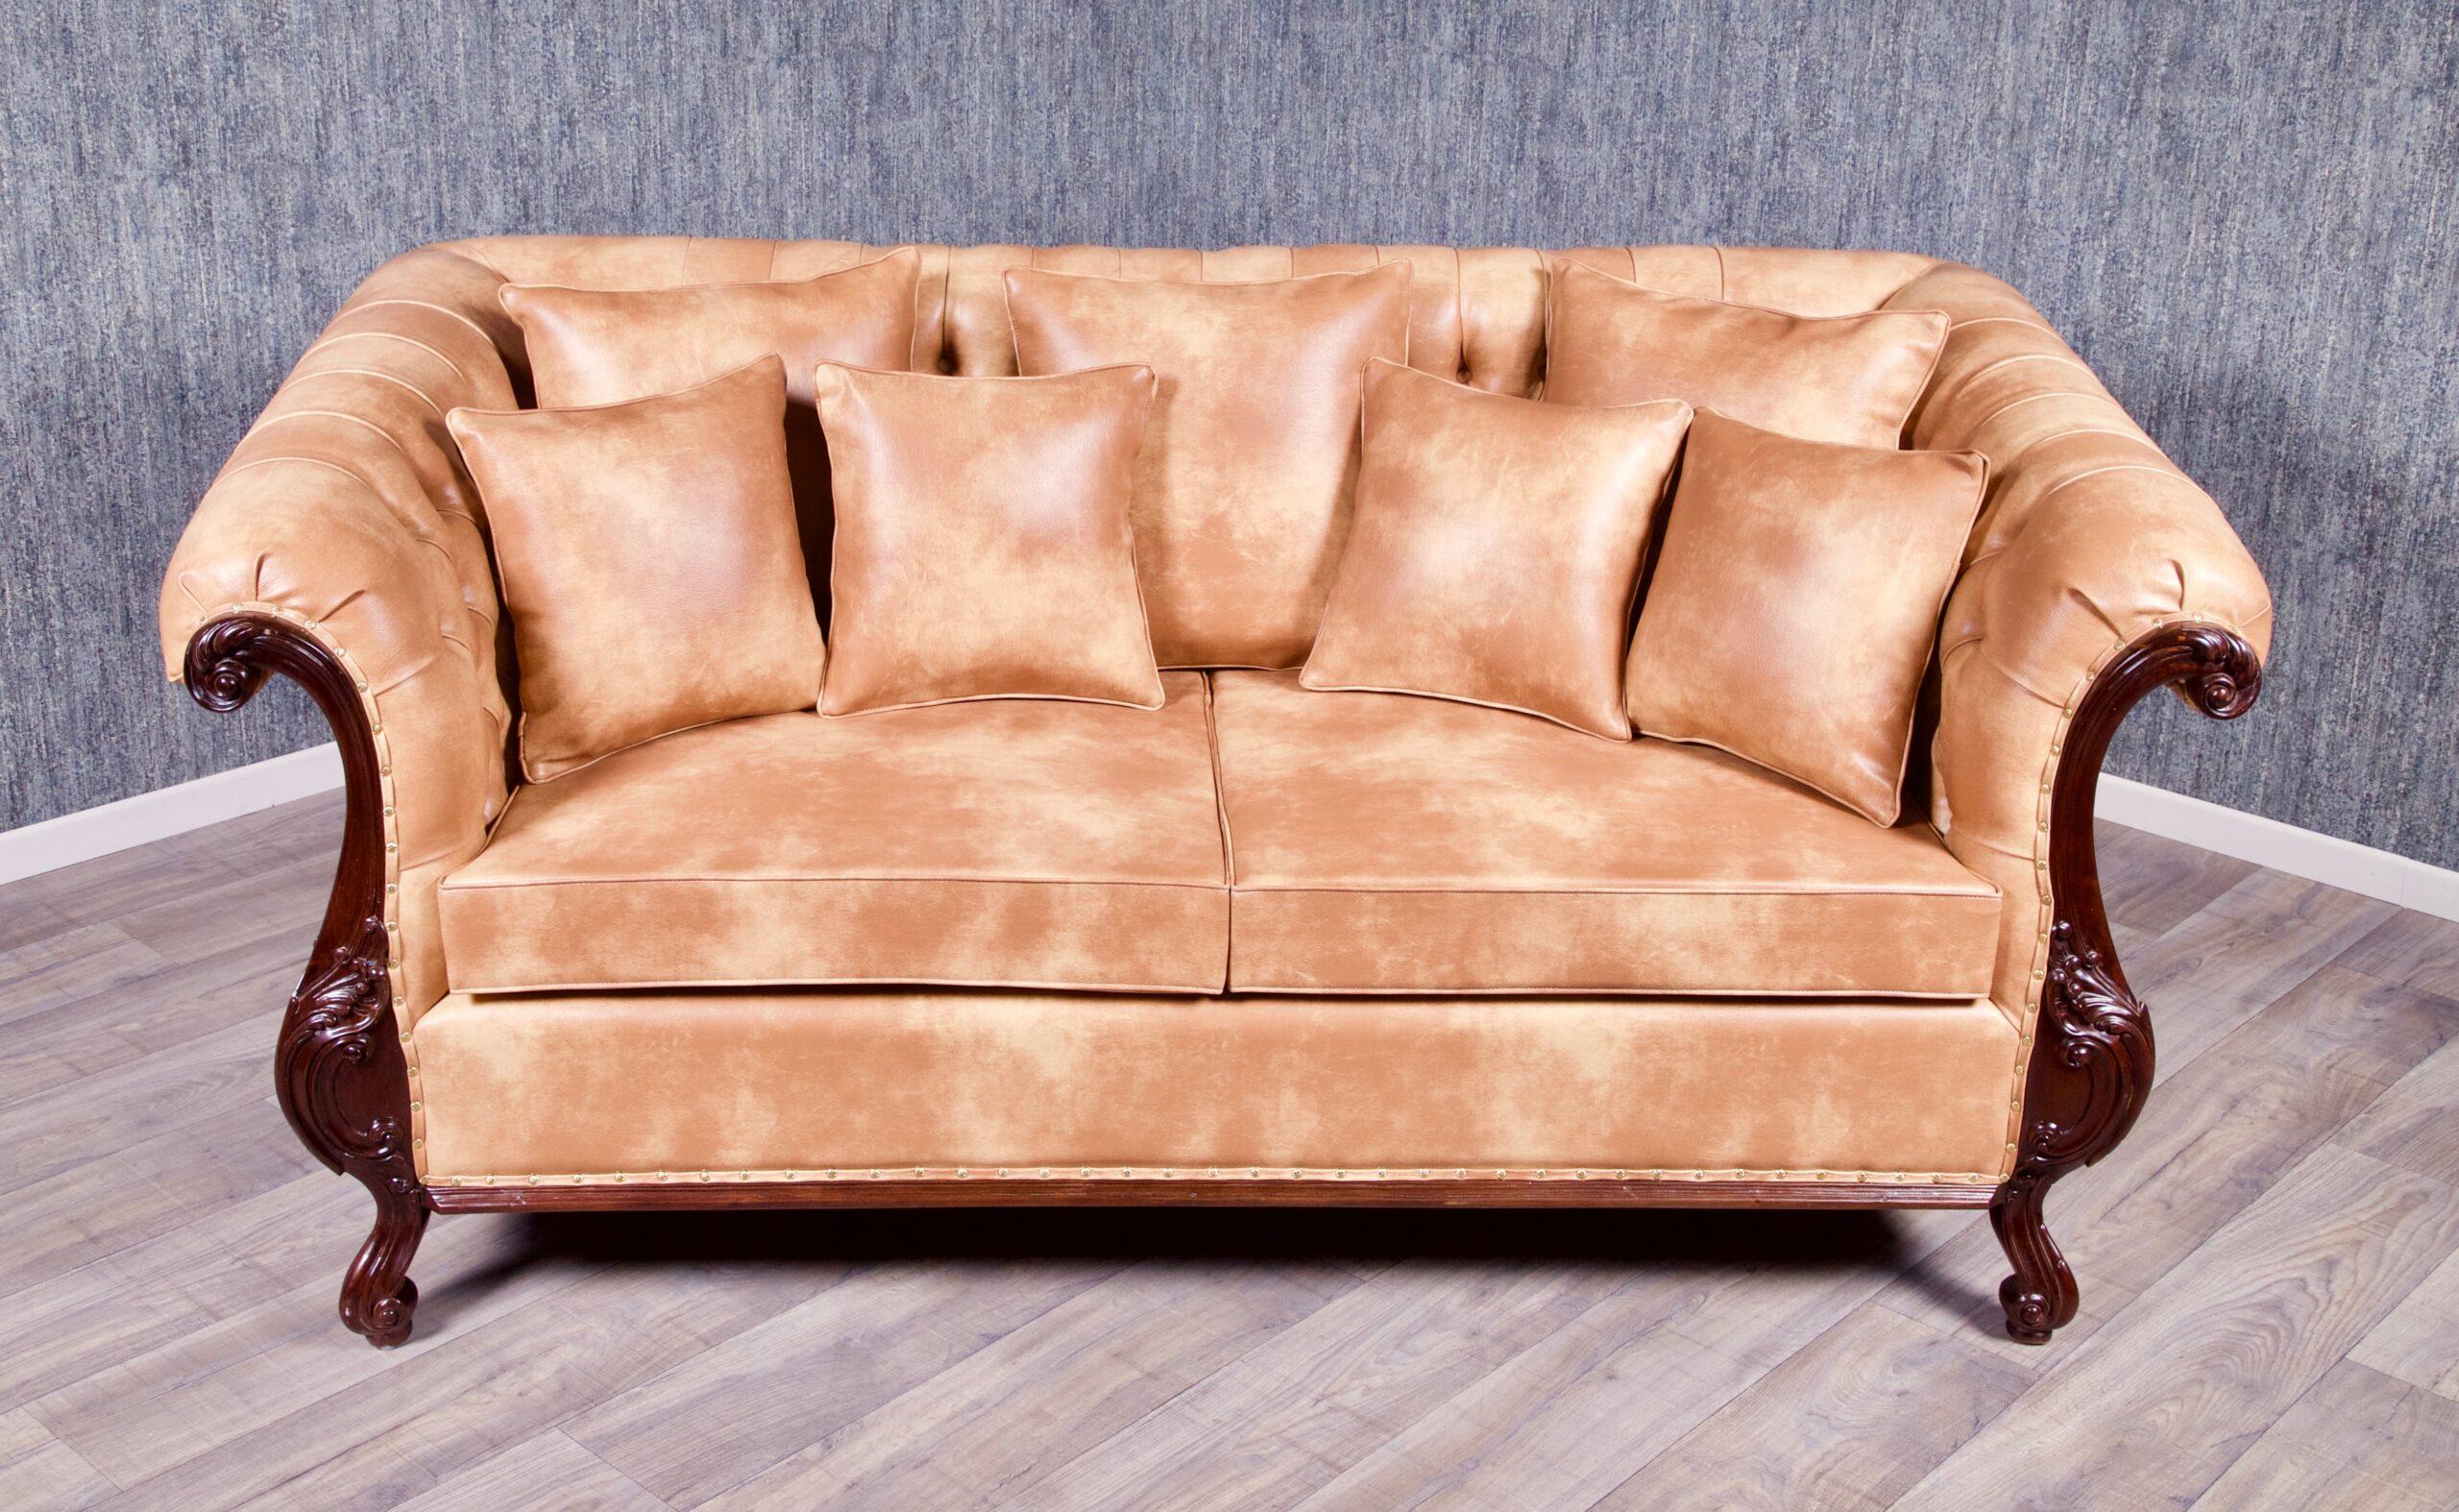 Full Size of Sofa Antik Couch Gebraucht Malaysia Kaufen Schweiz Stil Chesterfield 3 Sitzer Kolonial Braun Sofas Big Sam Leder Patchwork Garnitur Konfigurator Cassina Mit Sofa Sofa Antik